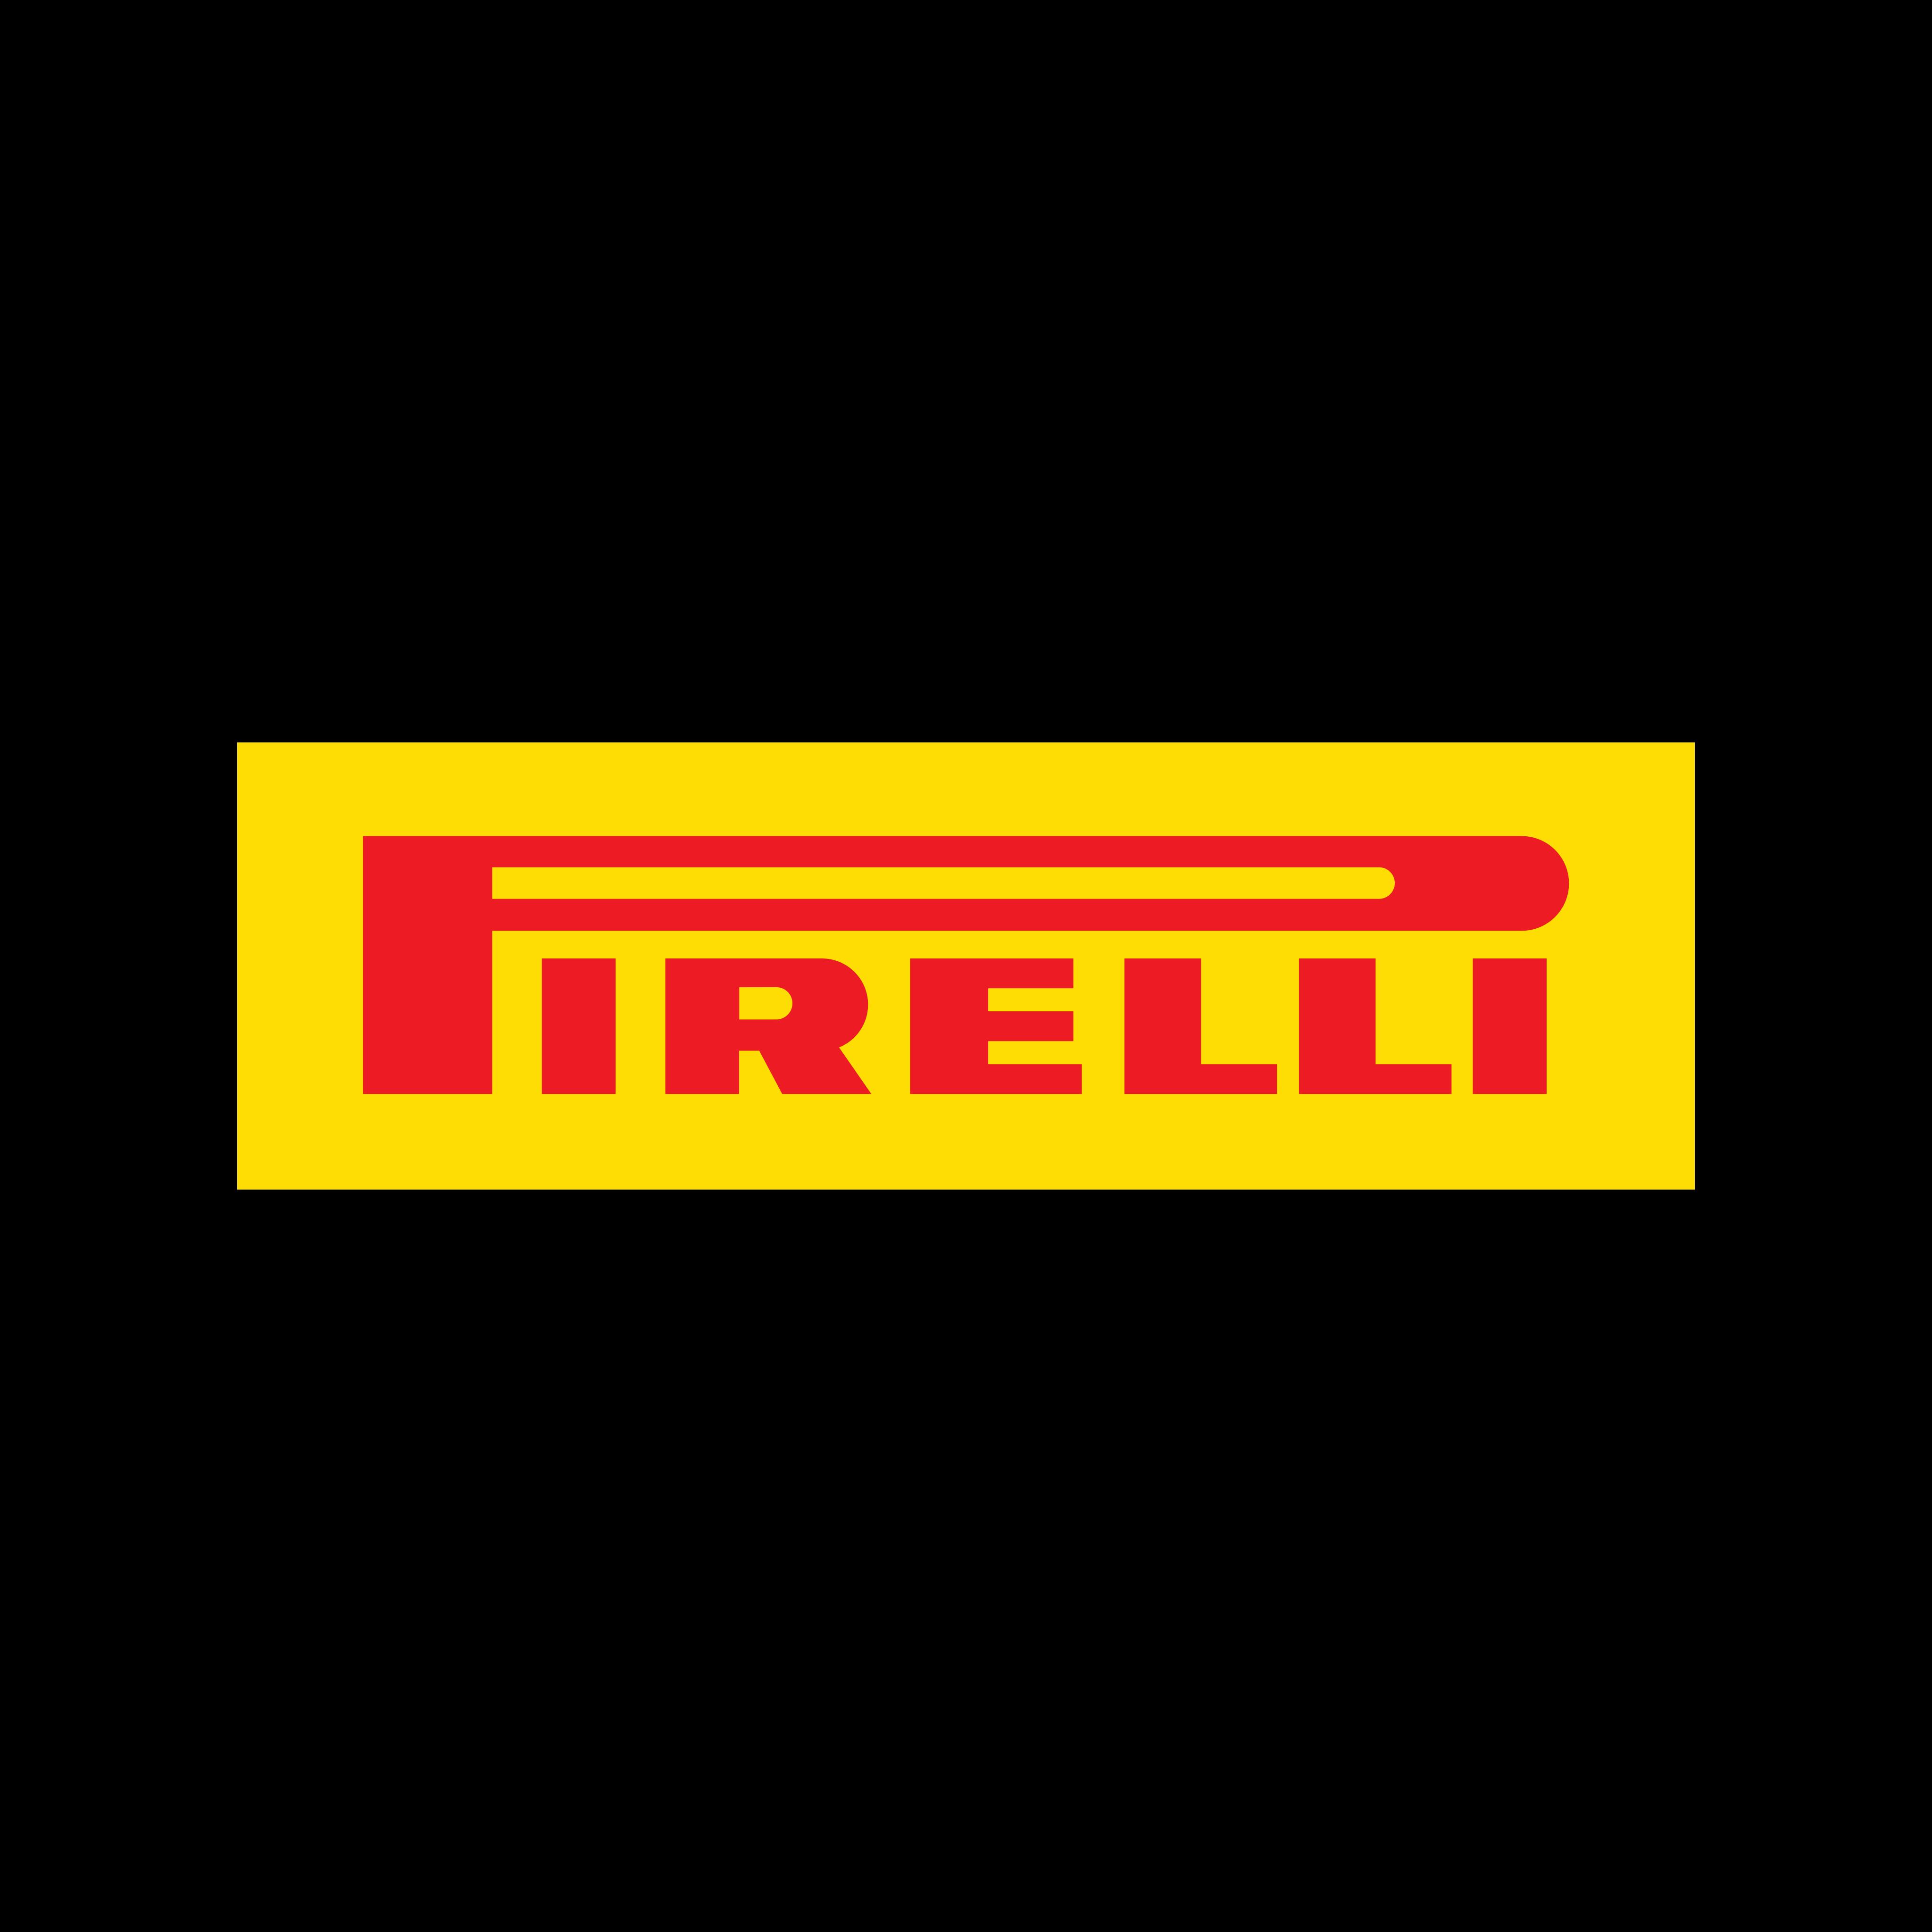 pirelli logo 0 - Pirelli Logo